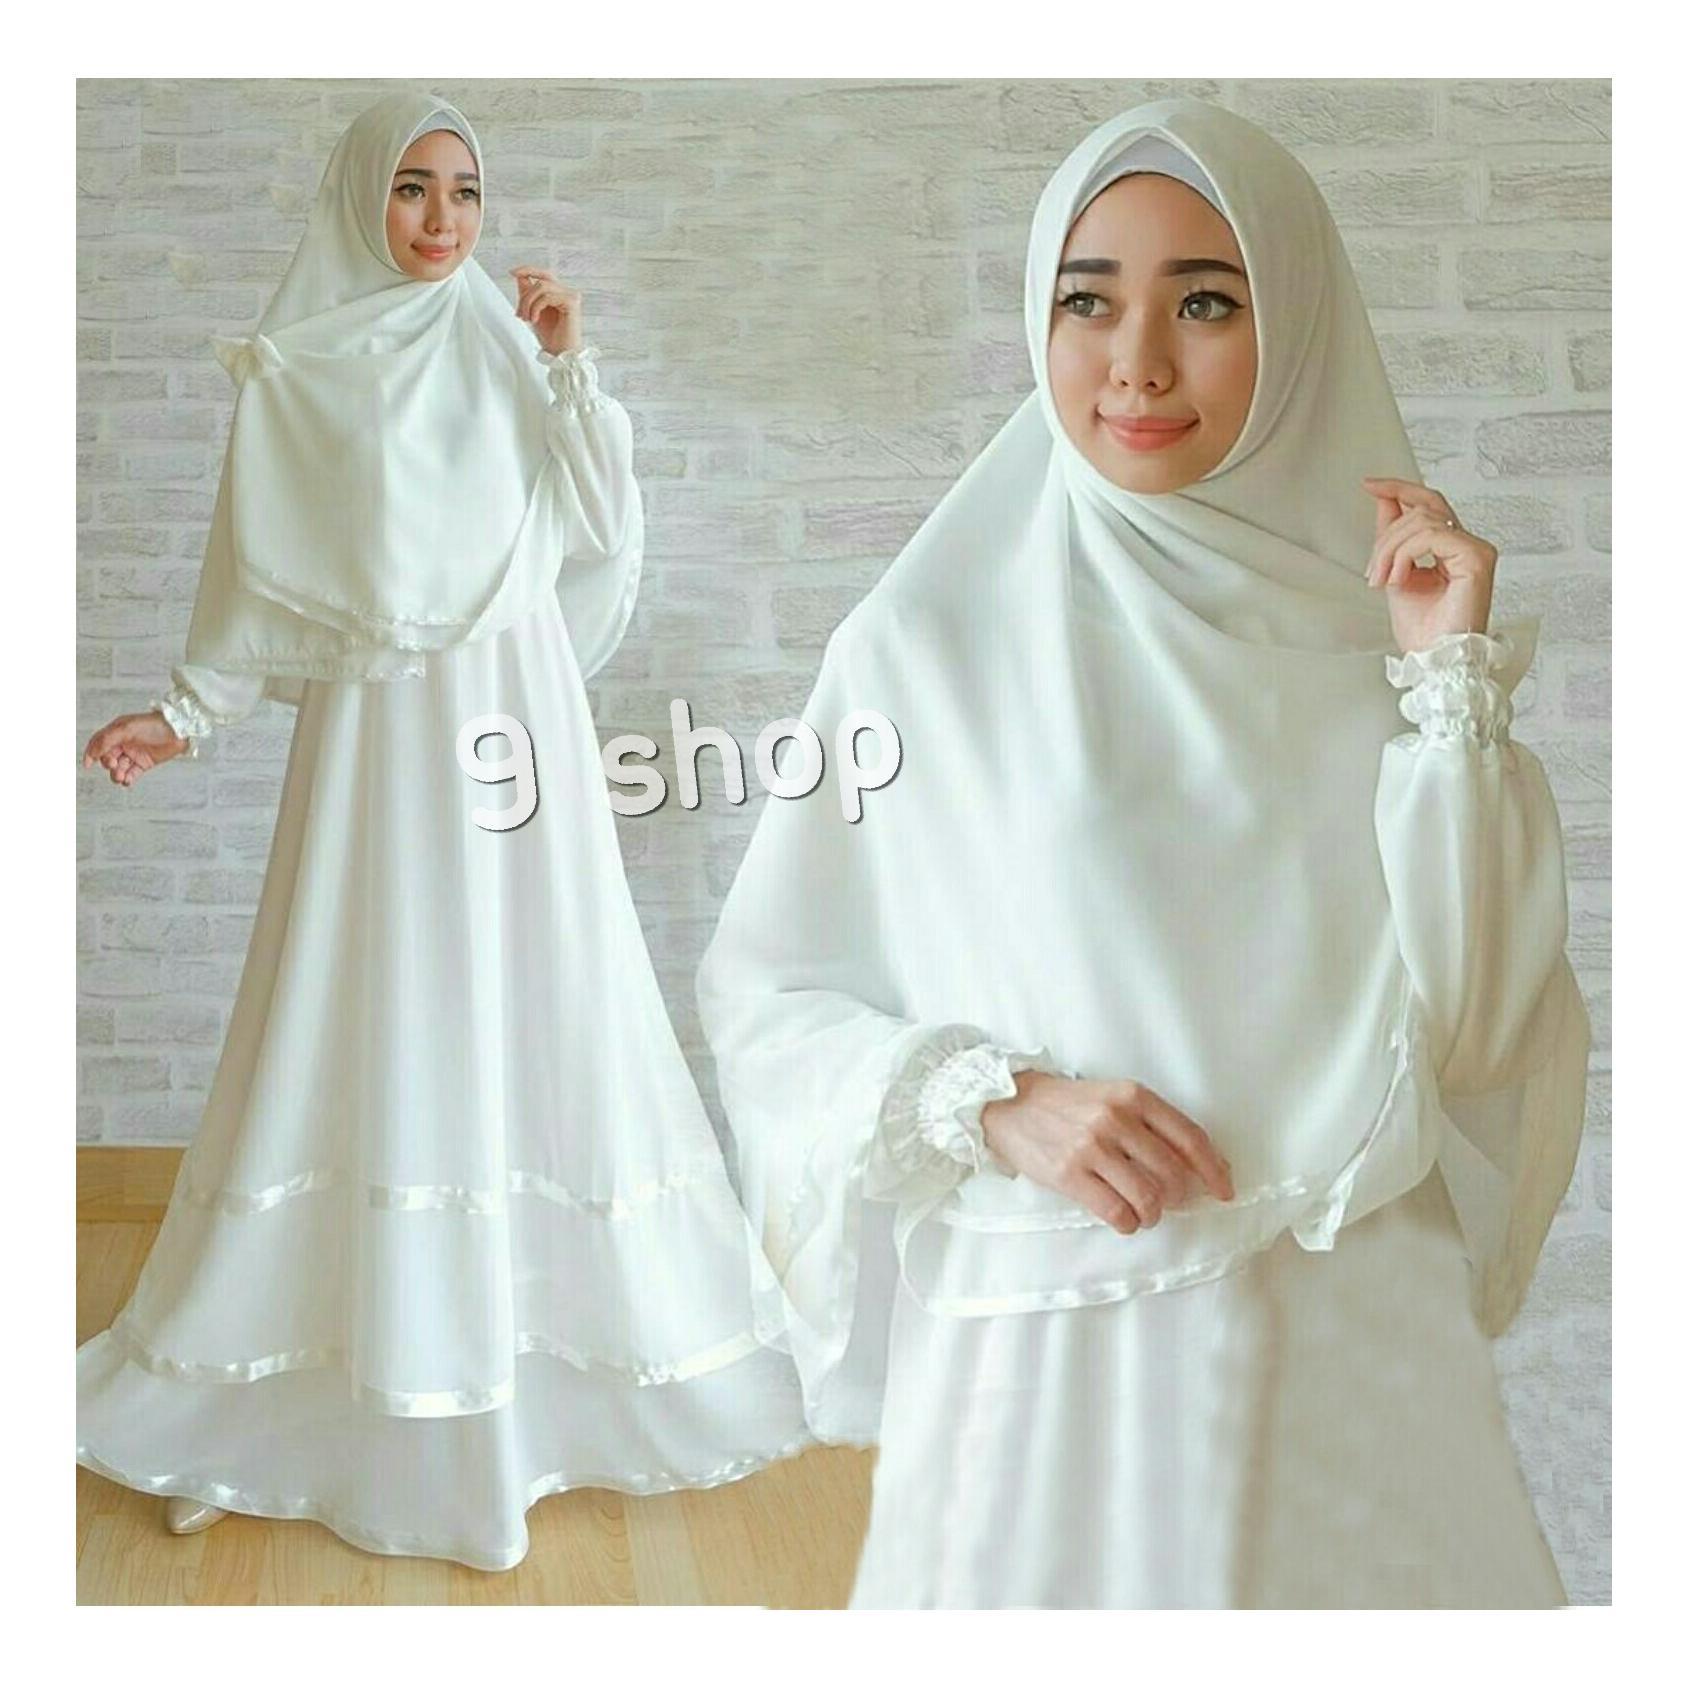 Harga 9 Shop Baju Gamis Dress Muslim Wanita Syari Anggun Dapat Obral Eve Ag  02 Modern d432d6536f